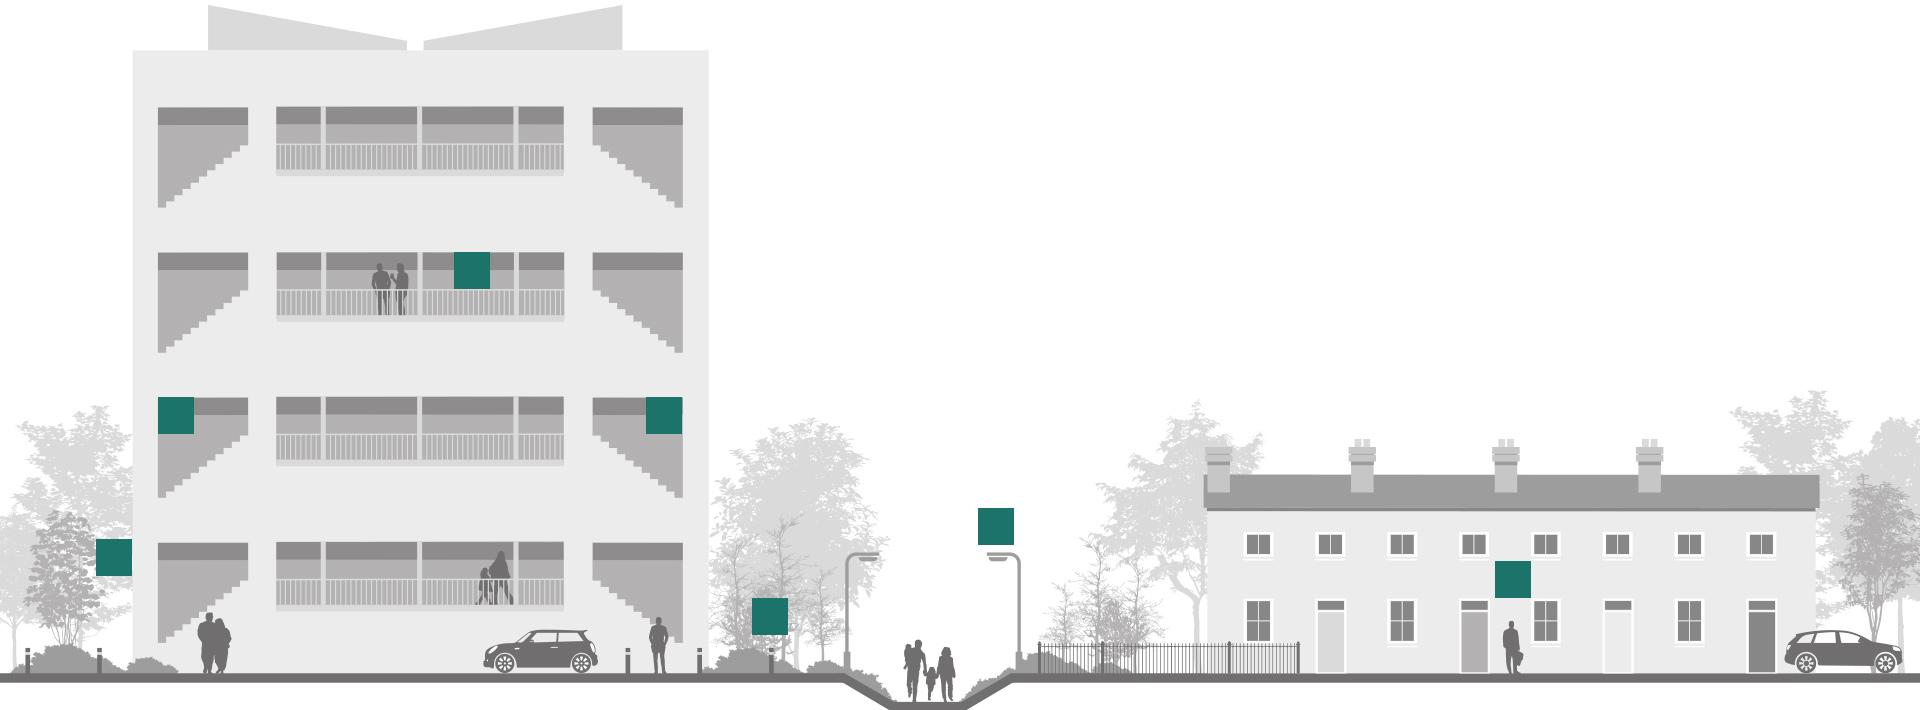 Community_Public_applications_social_housing_external